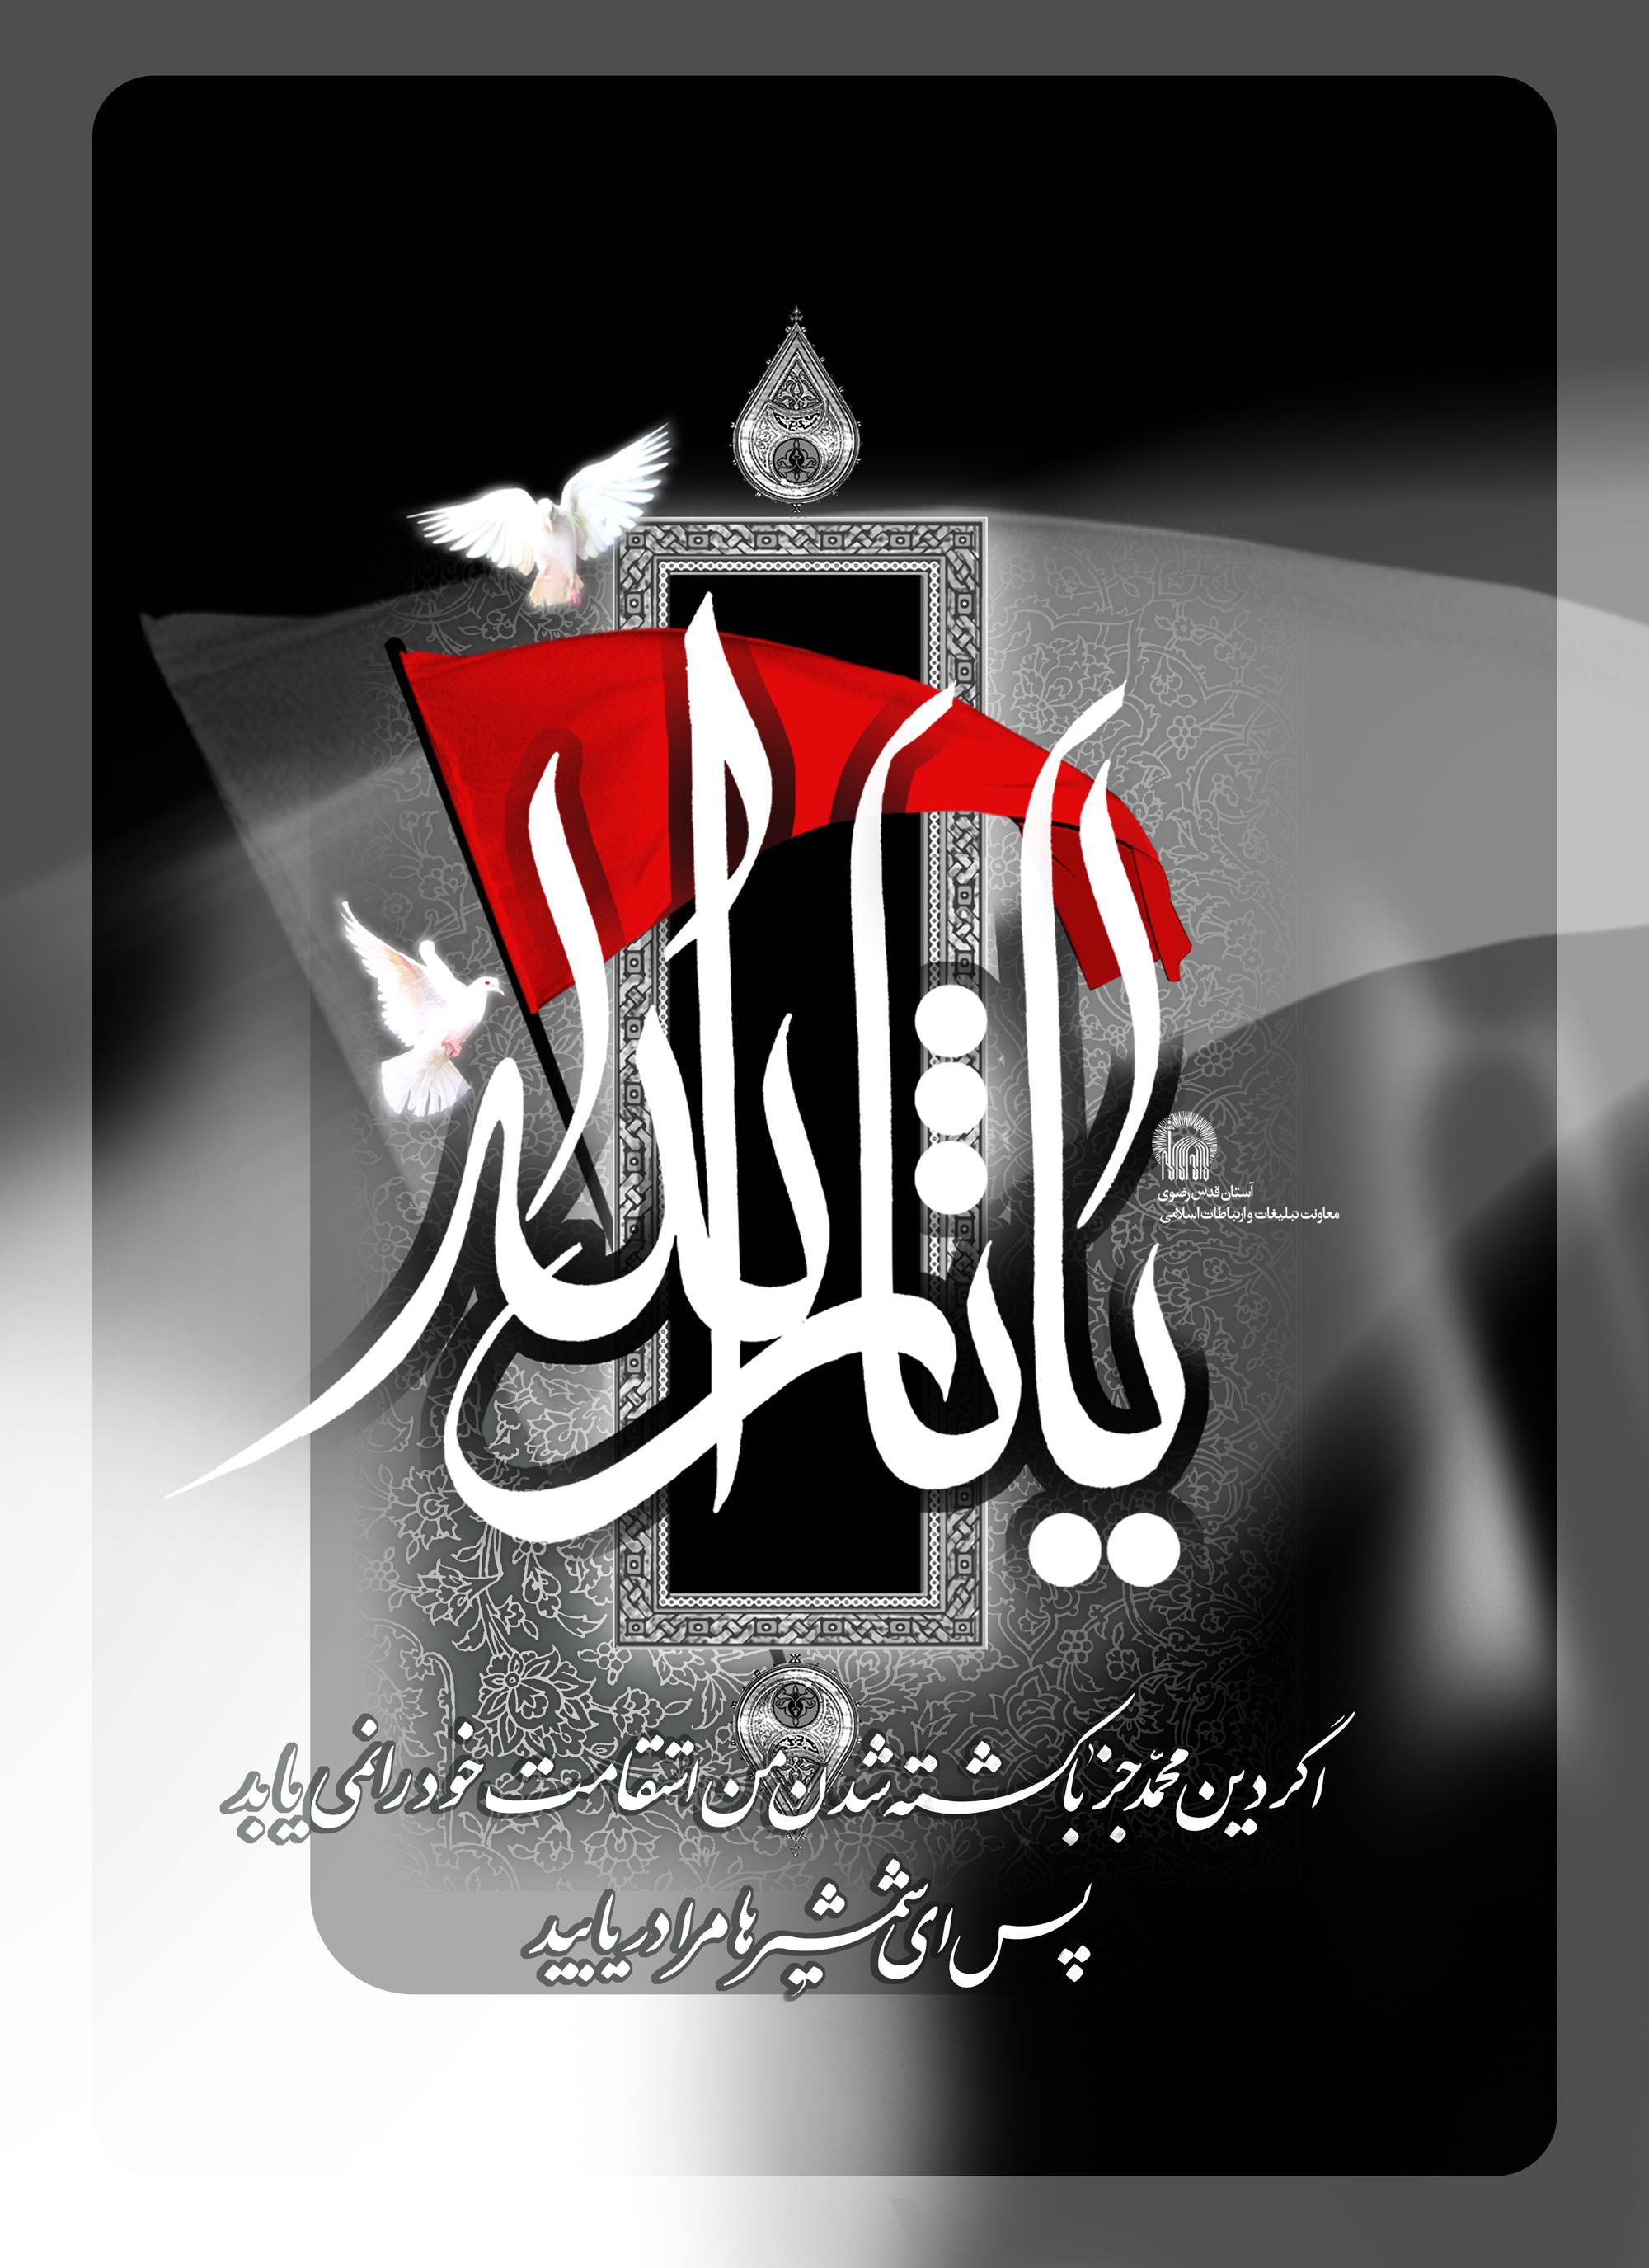 ۰۱۱_ImamHussein_www.IslamicWallpaper